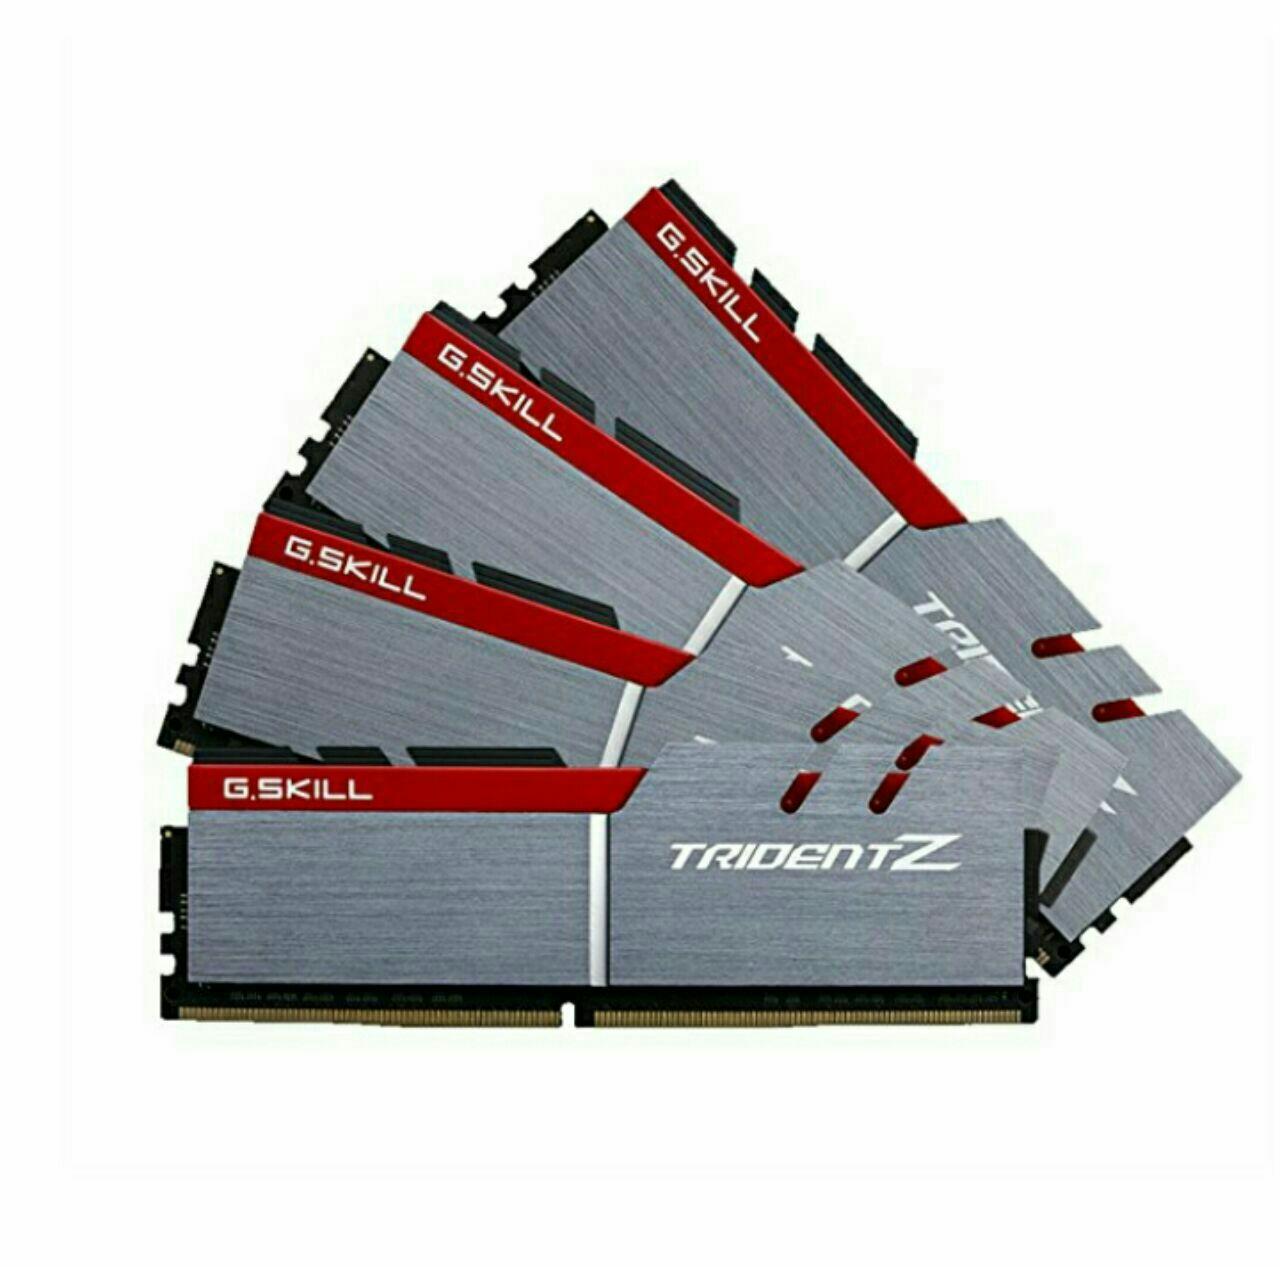 RAM 32GB DDR4 3200Mhz (4 x 8gb)